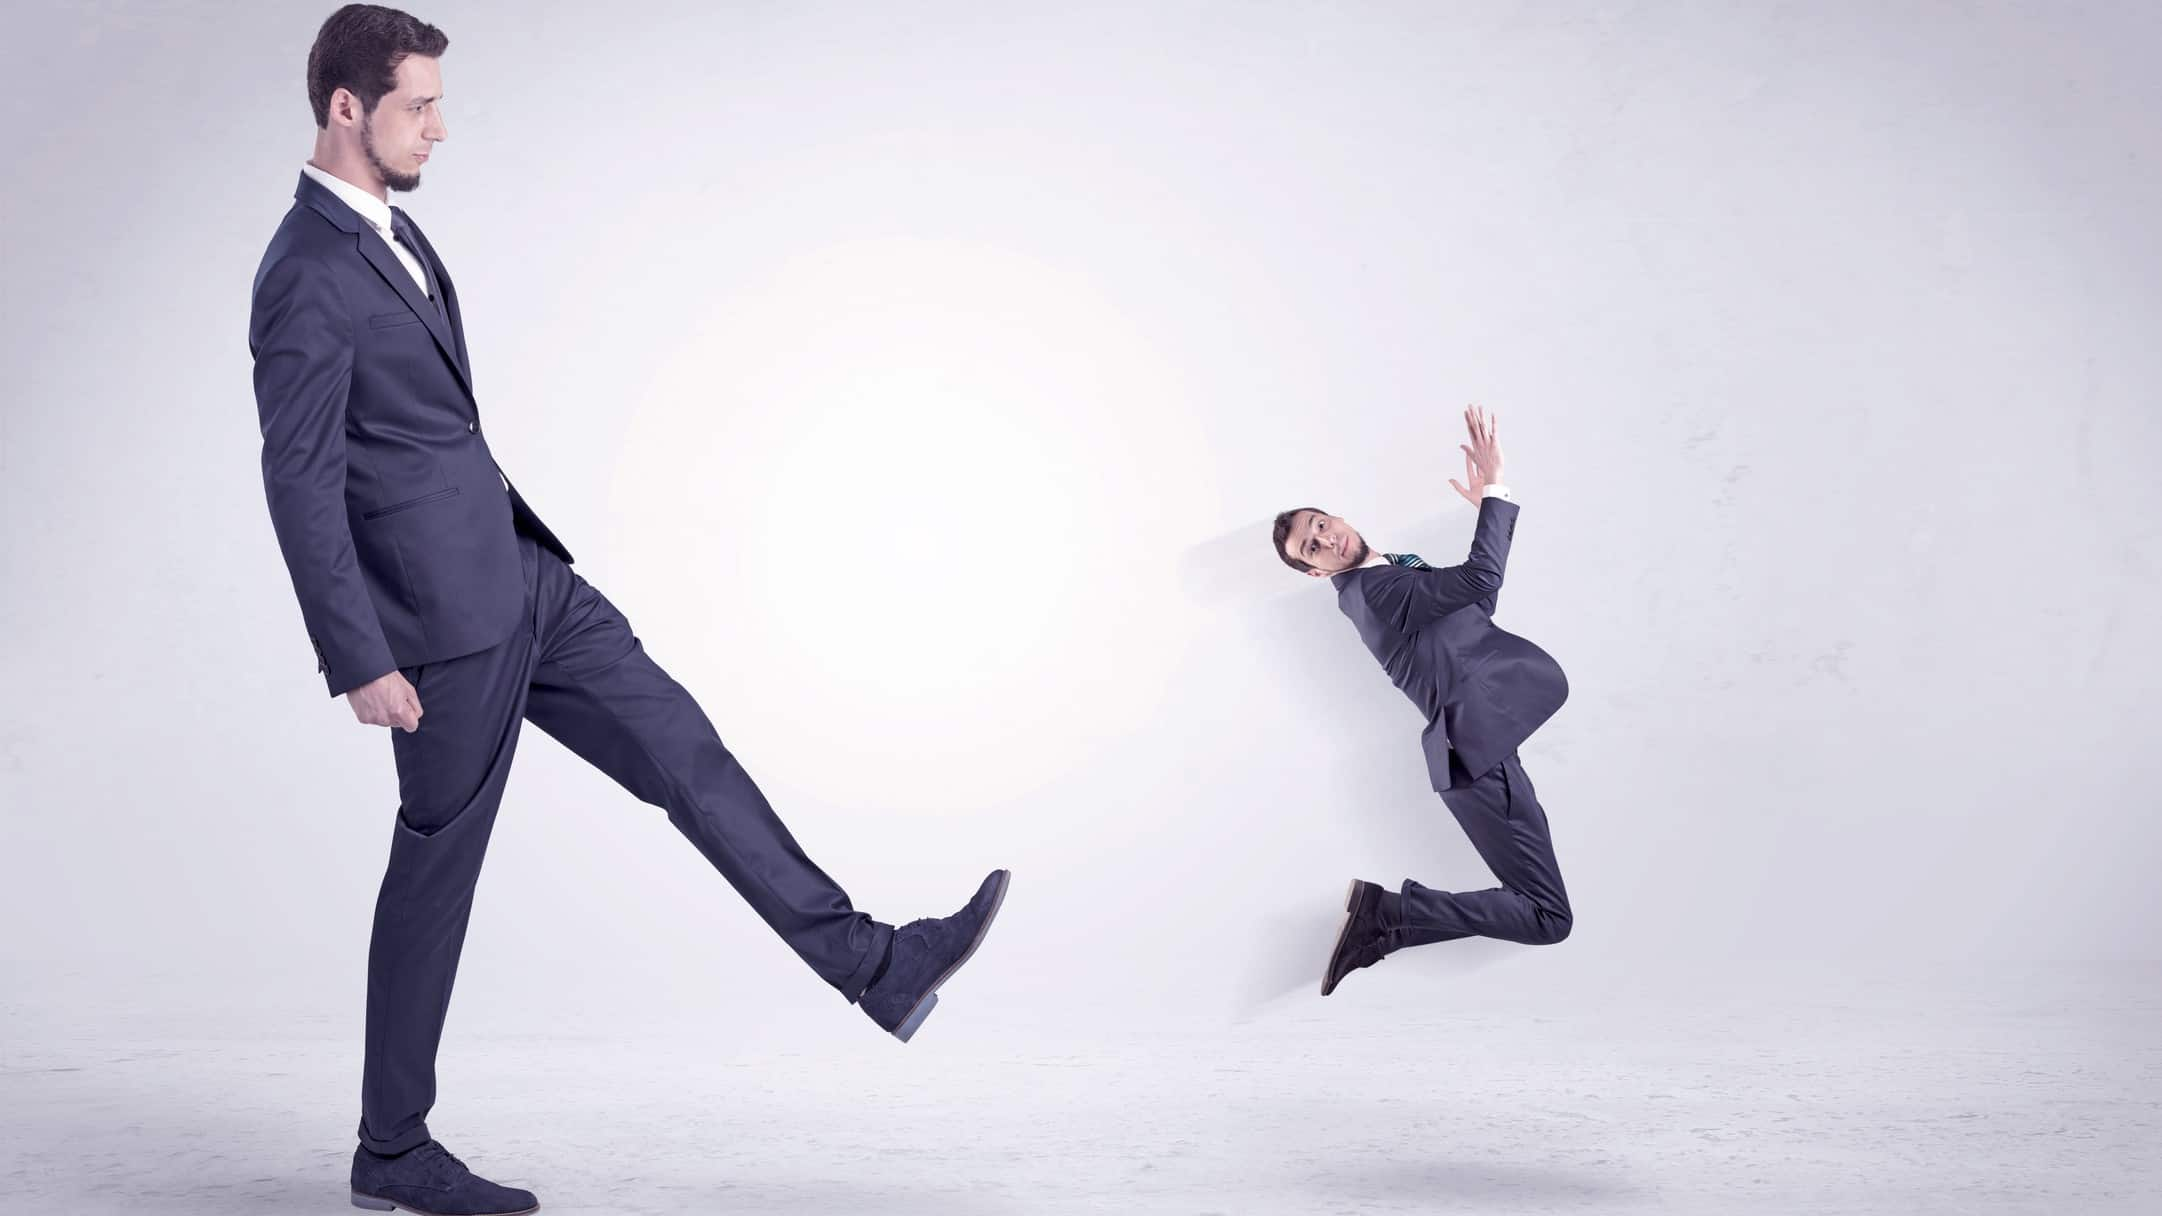 asx share price resignation represented by man kicking miniature man through the air